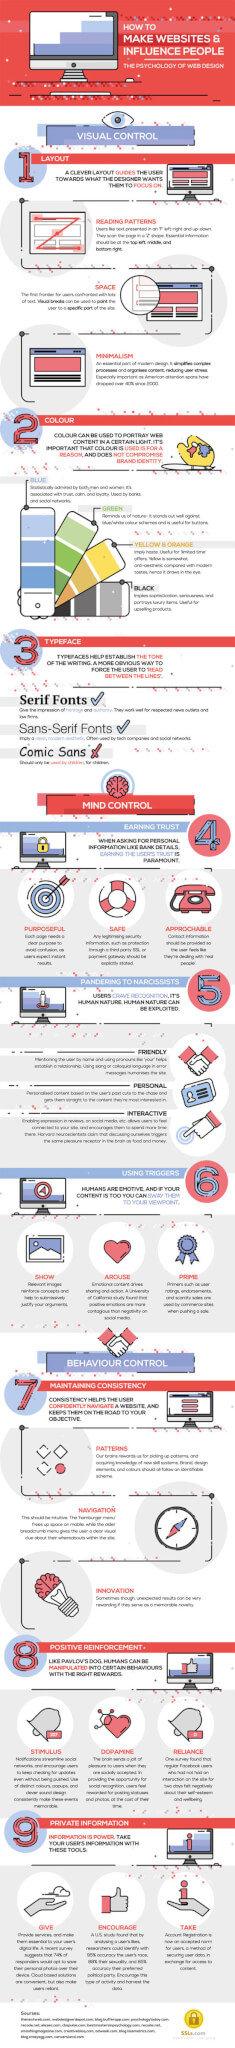 como-hacer-sitios-conviertan-psicologia-diseno-web-infografia